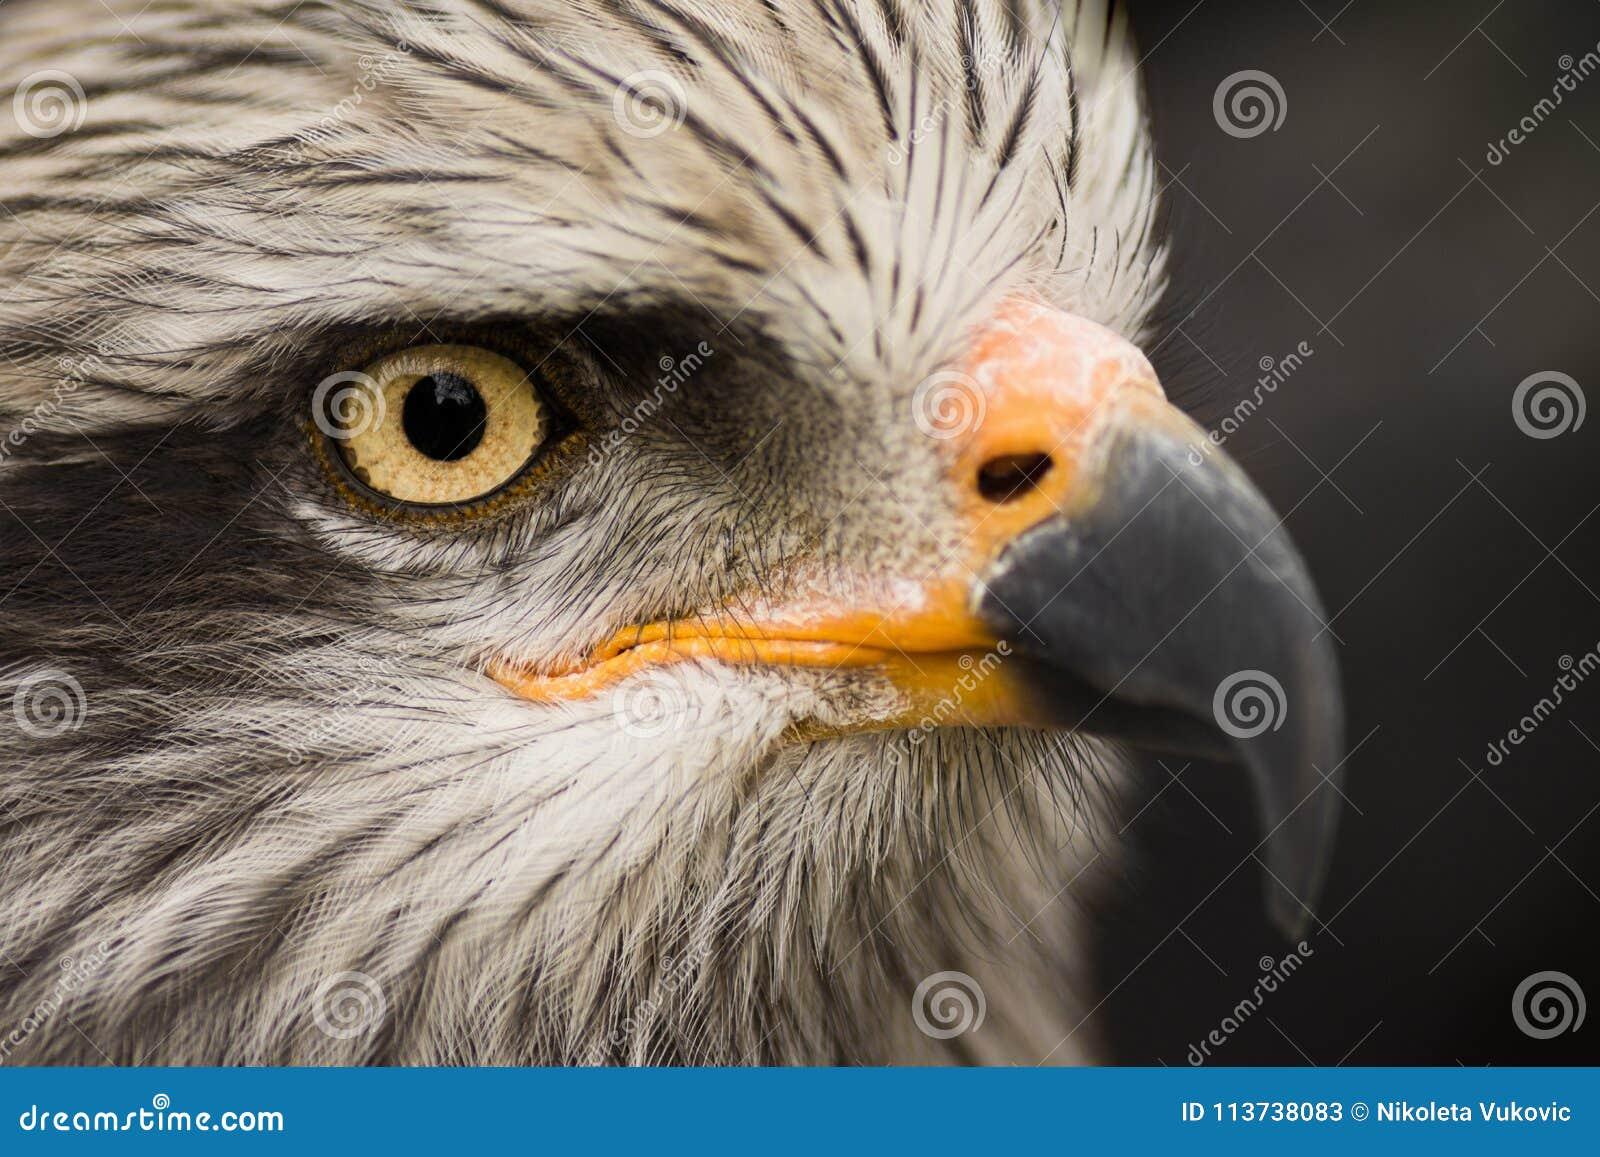 Eagle bird animal portrait